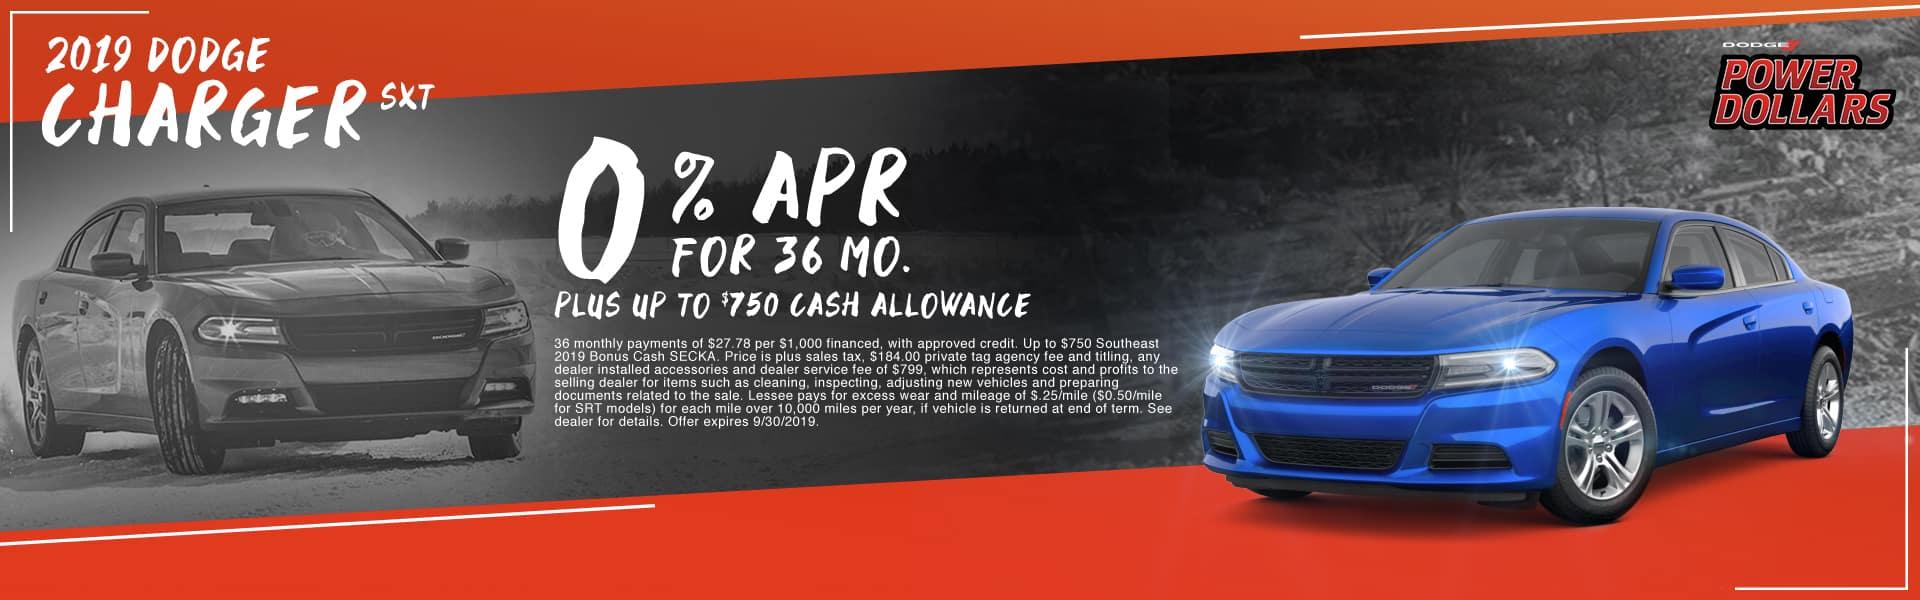 2019 Dodge Charger SXT | 0% APR For 36 Months PLUS Up To $750 Cash Allowance | Dodge Power Dollars